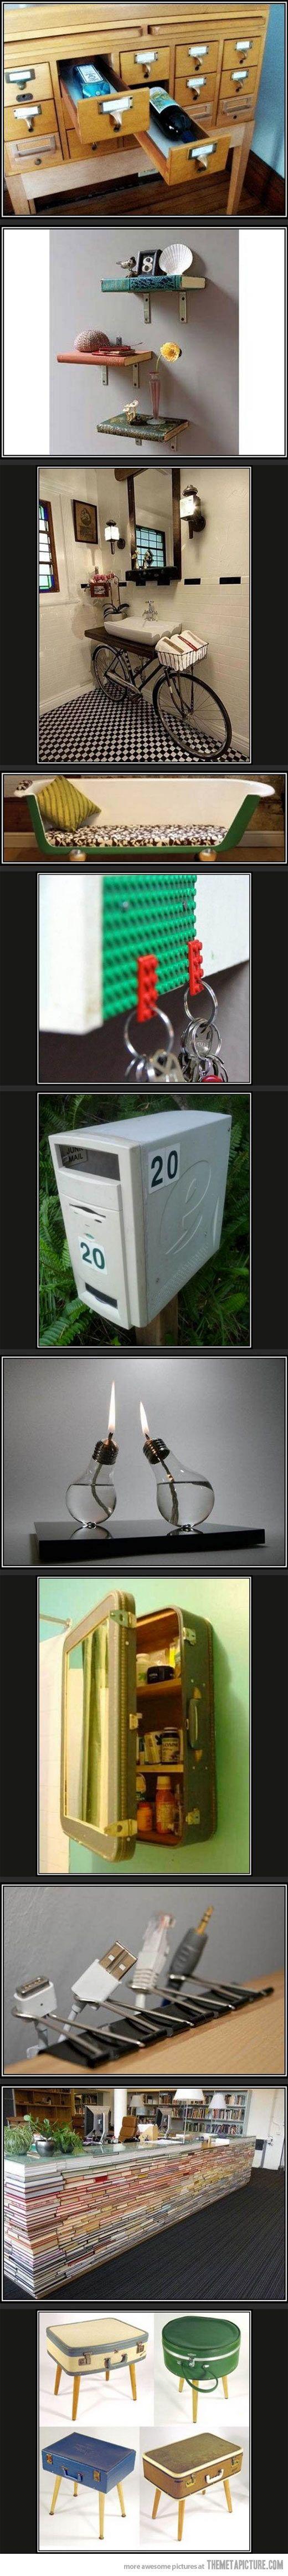 Creative ways to repurpose old stuff...